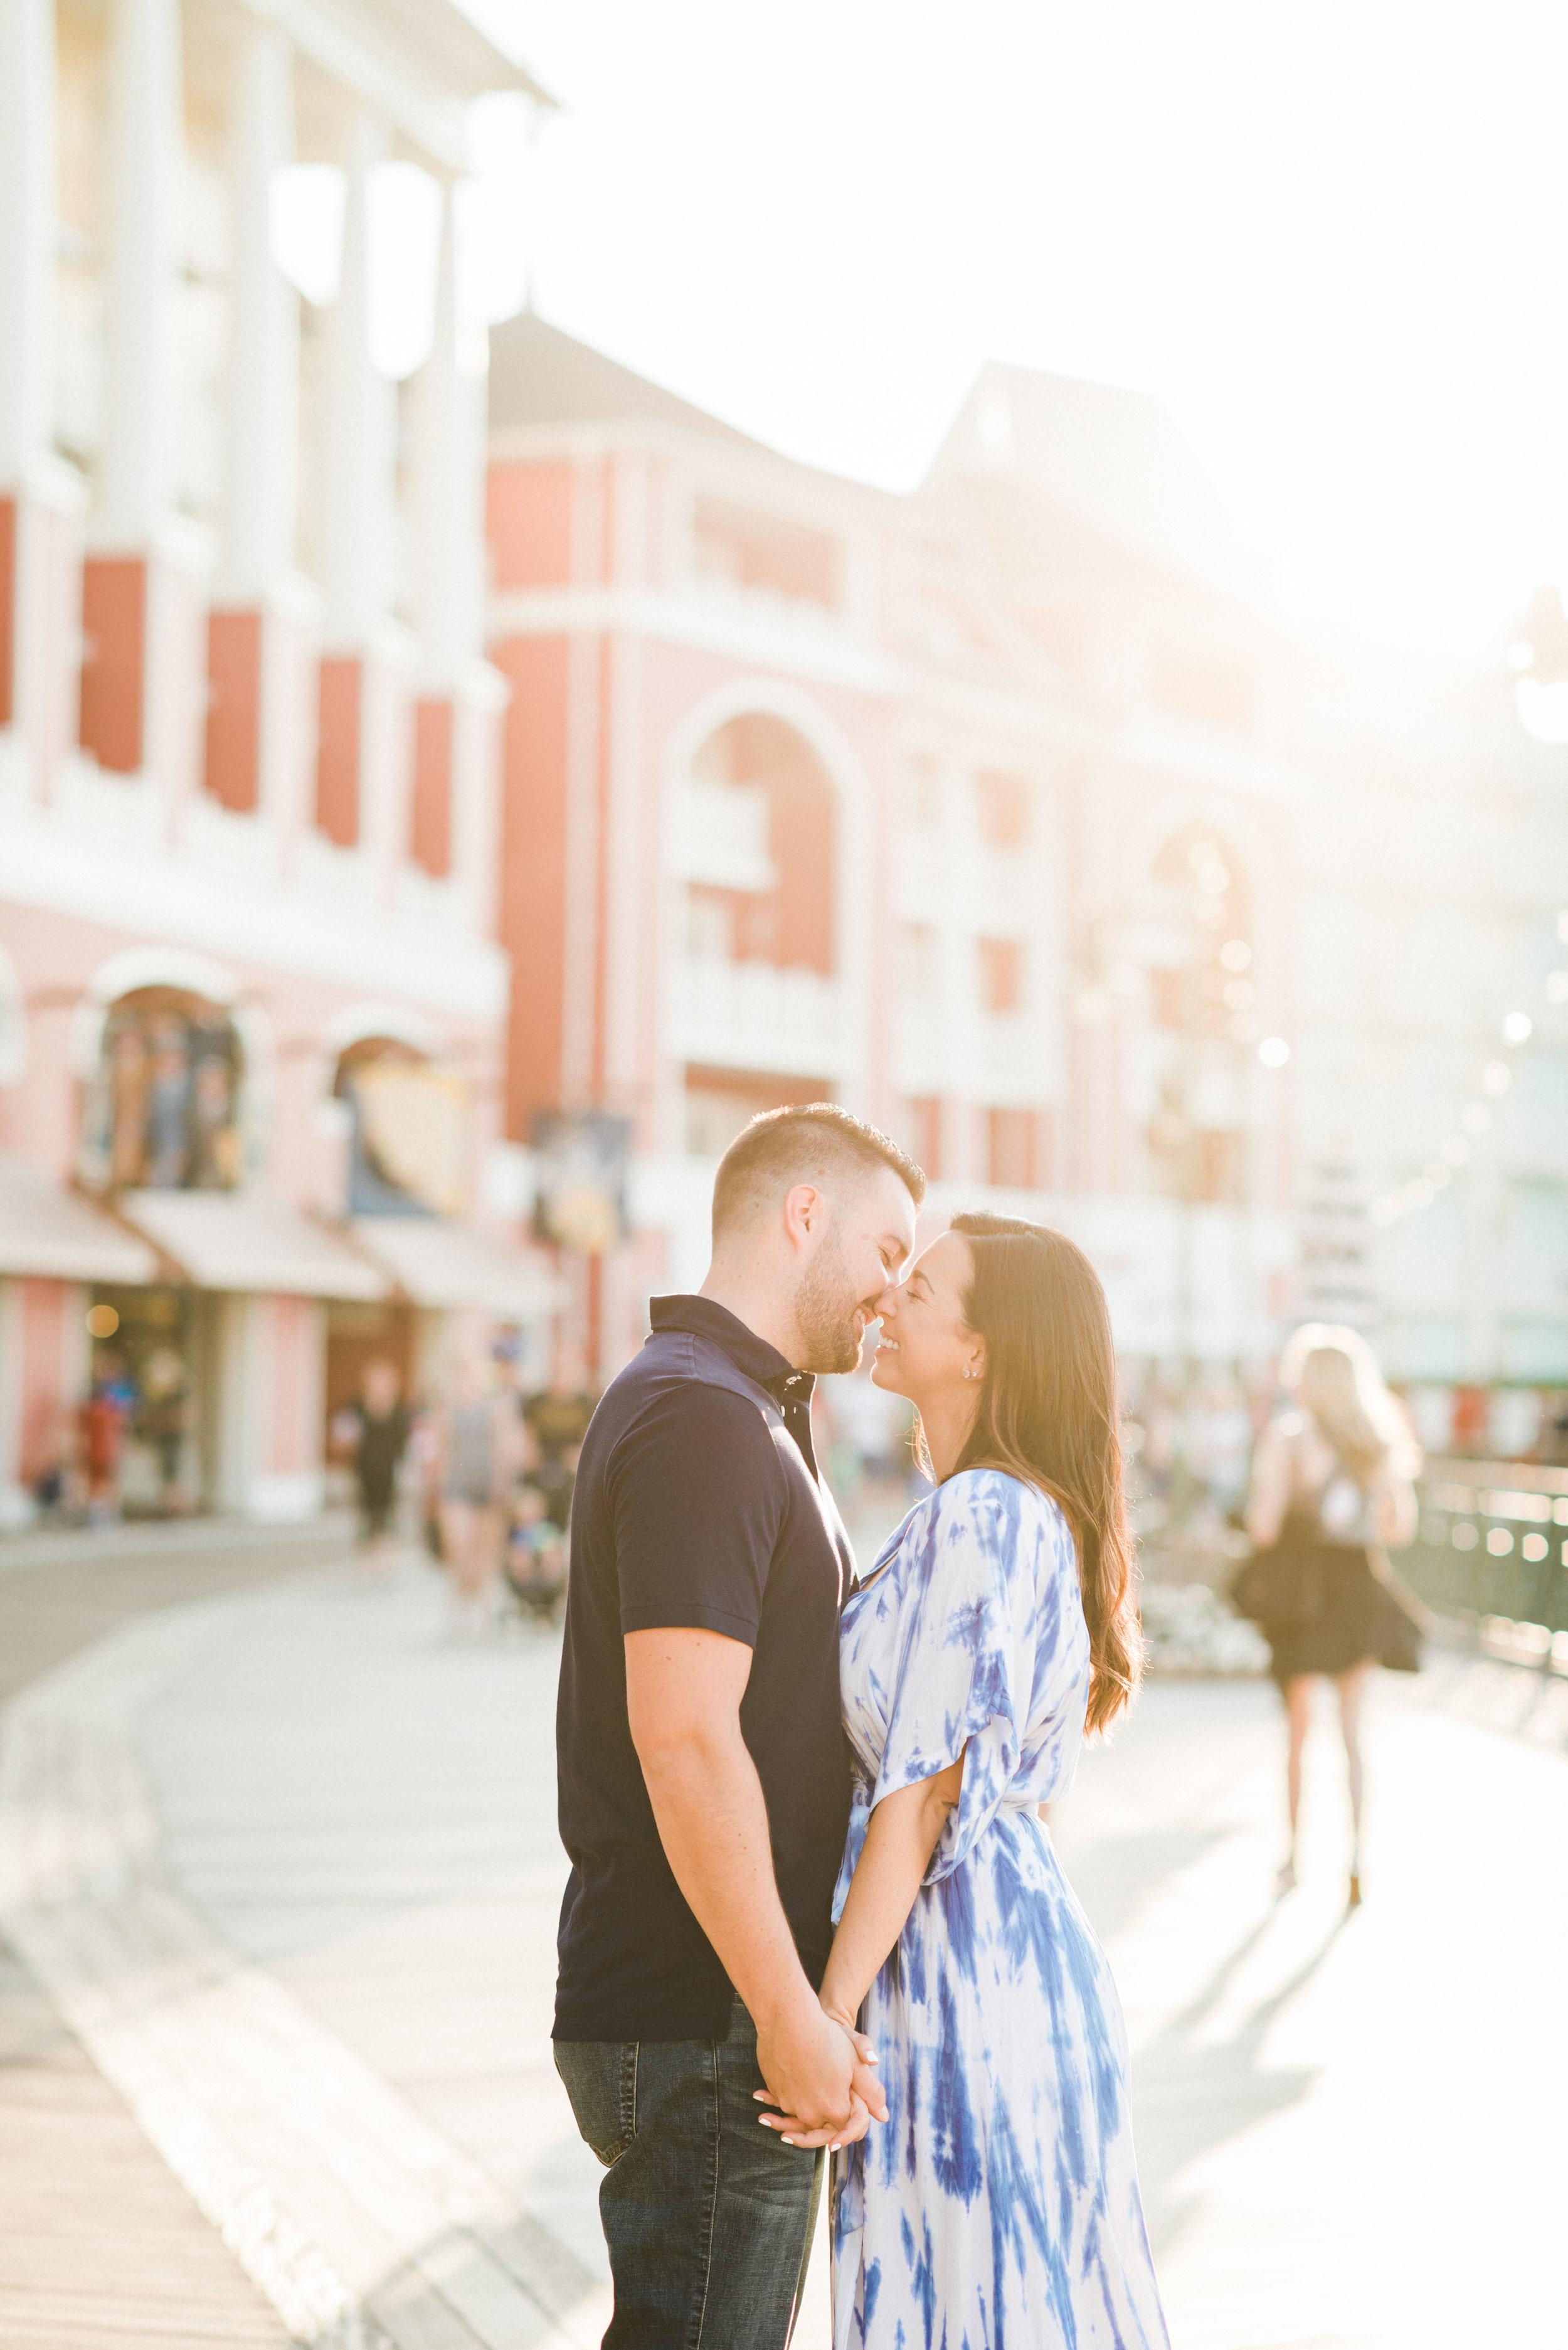 KateTaramykinStudios-Portfolio-Couples-3.jpg